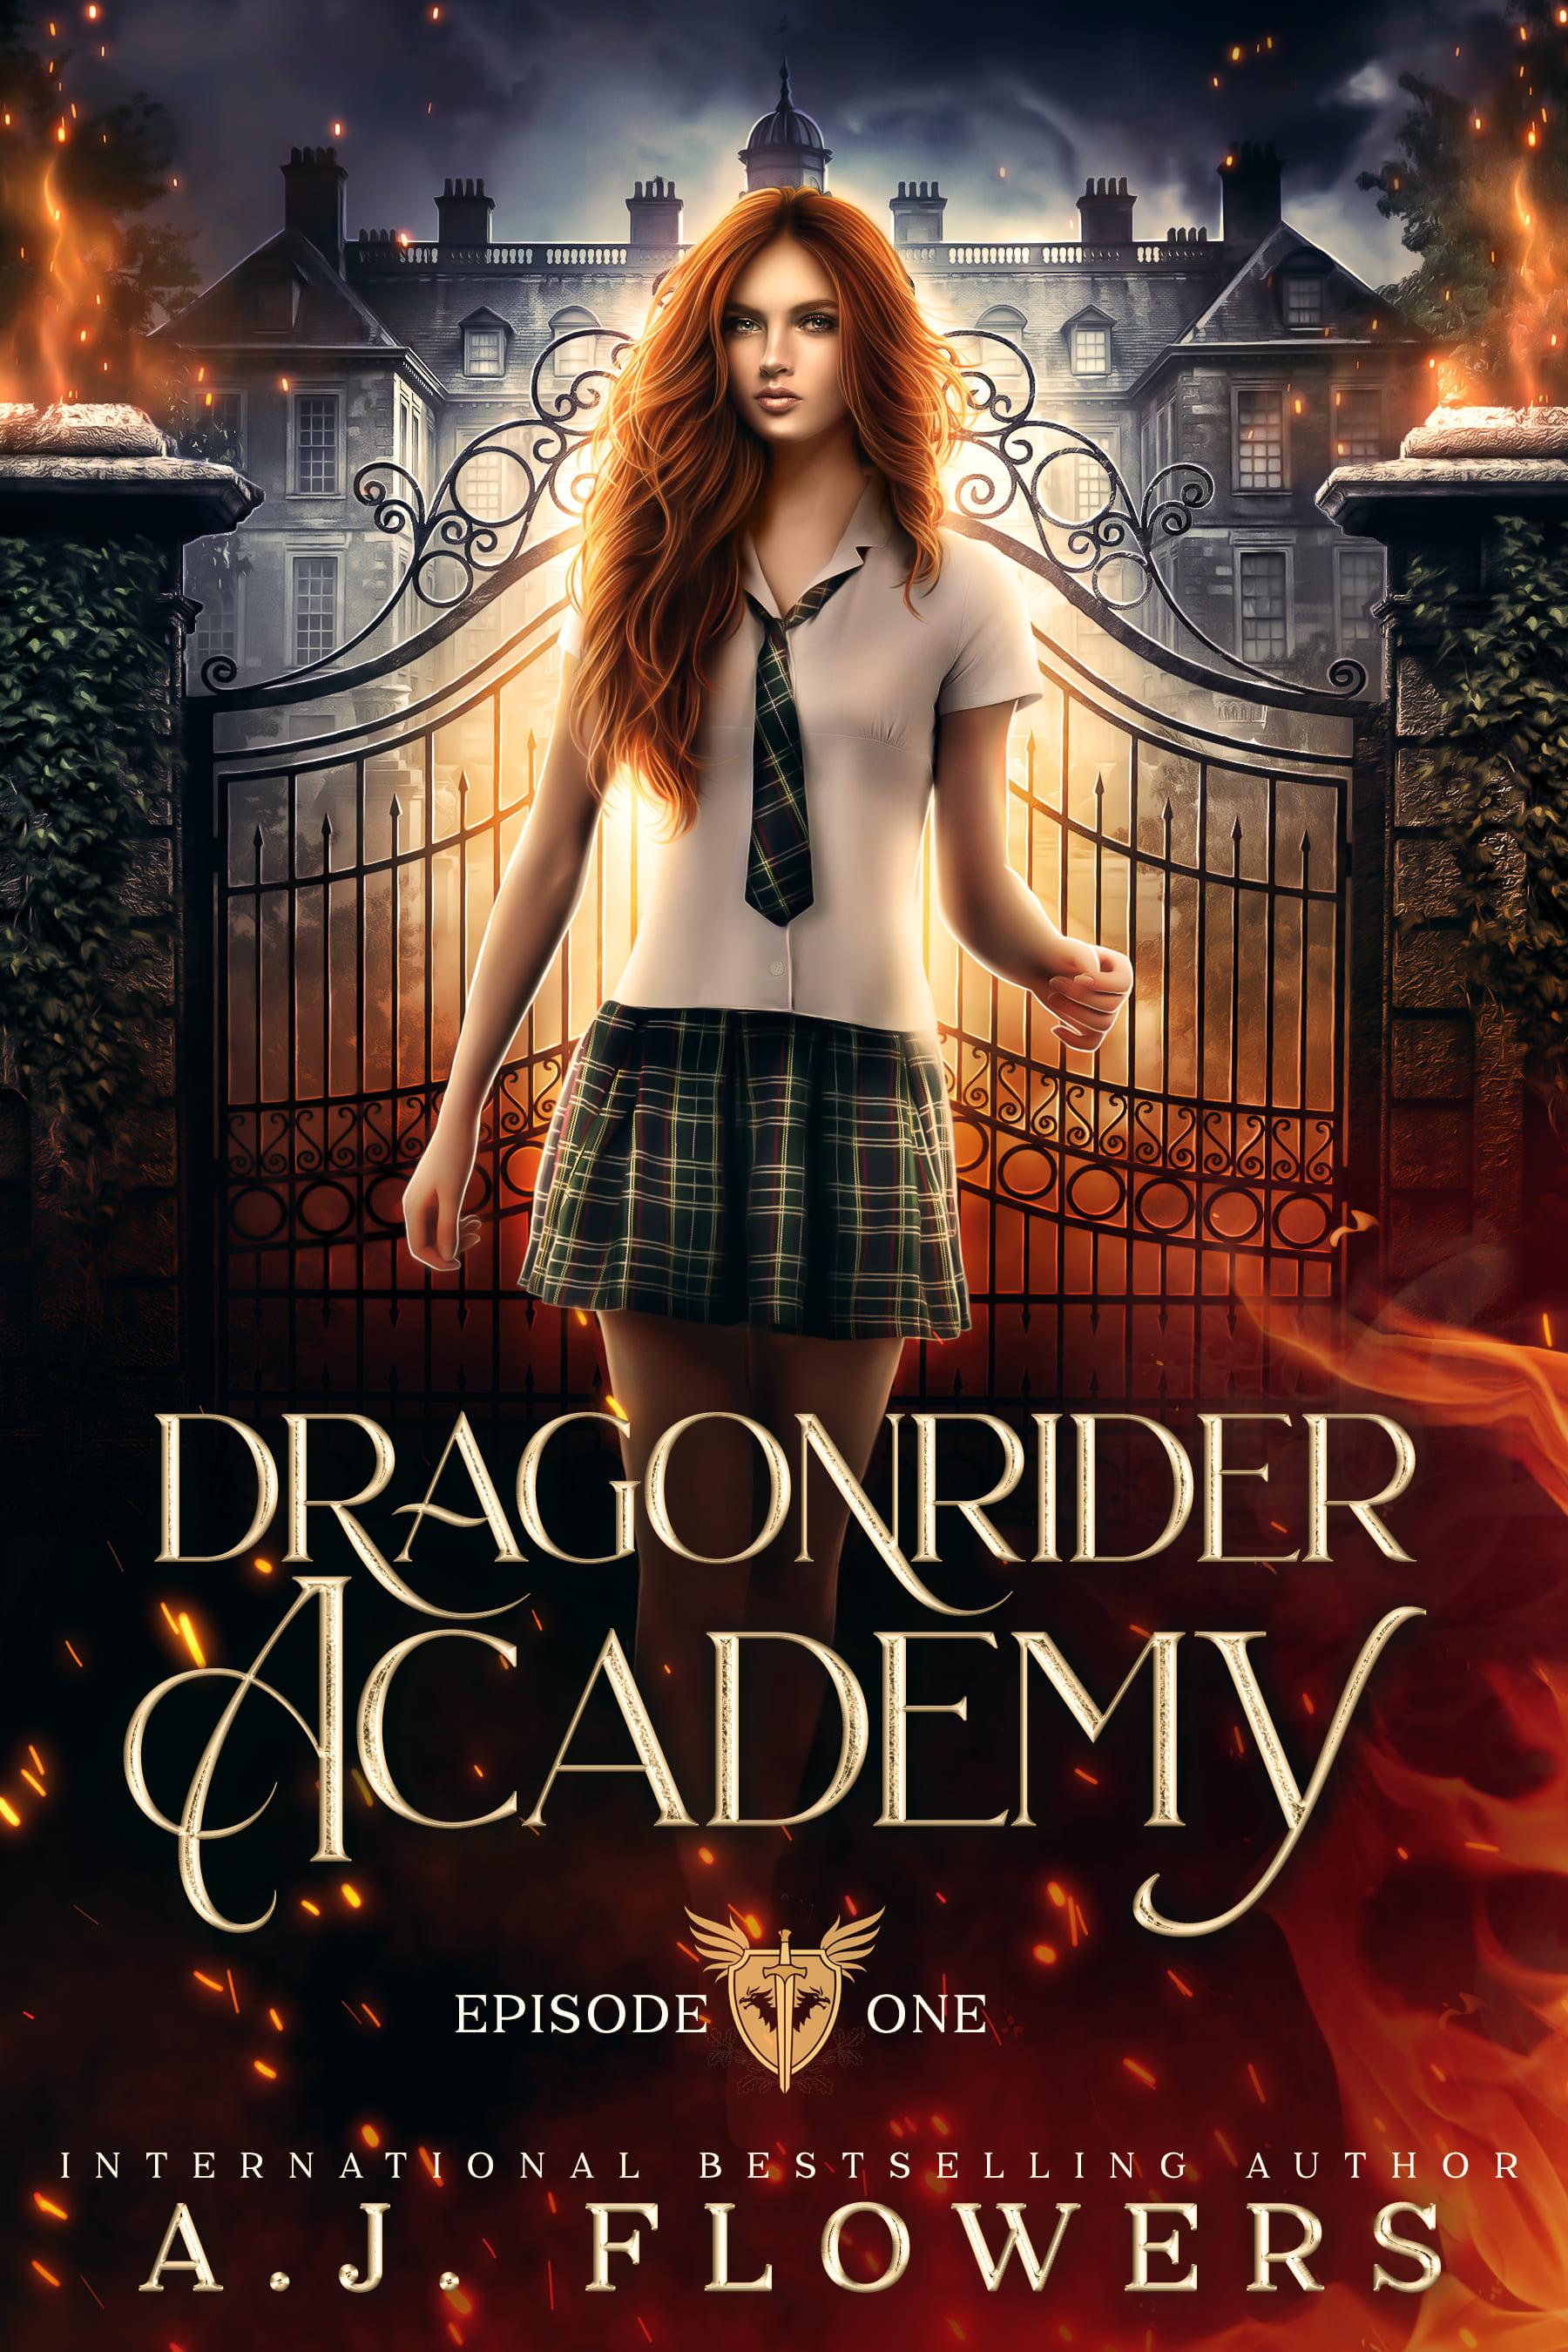 [PDF] [EPUB] Dragonrider Academy (Episode 1) Download by A.J. Flowers